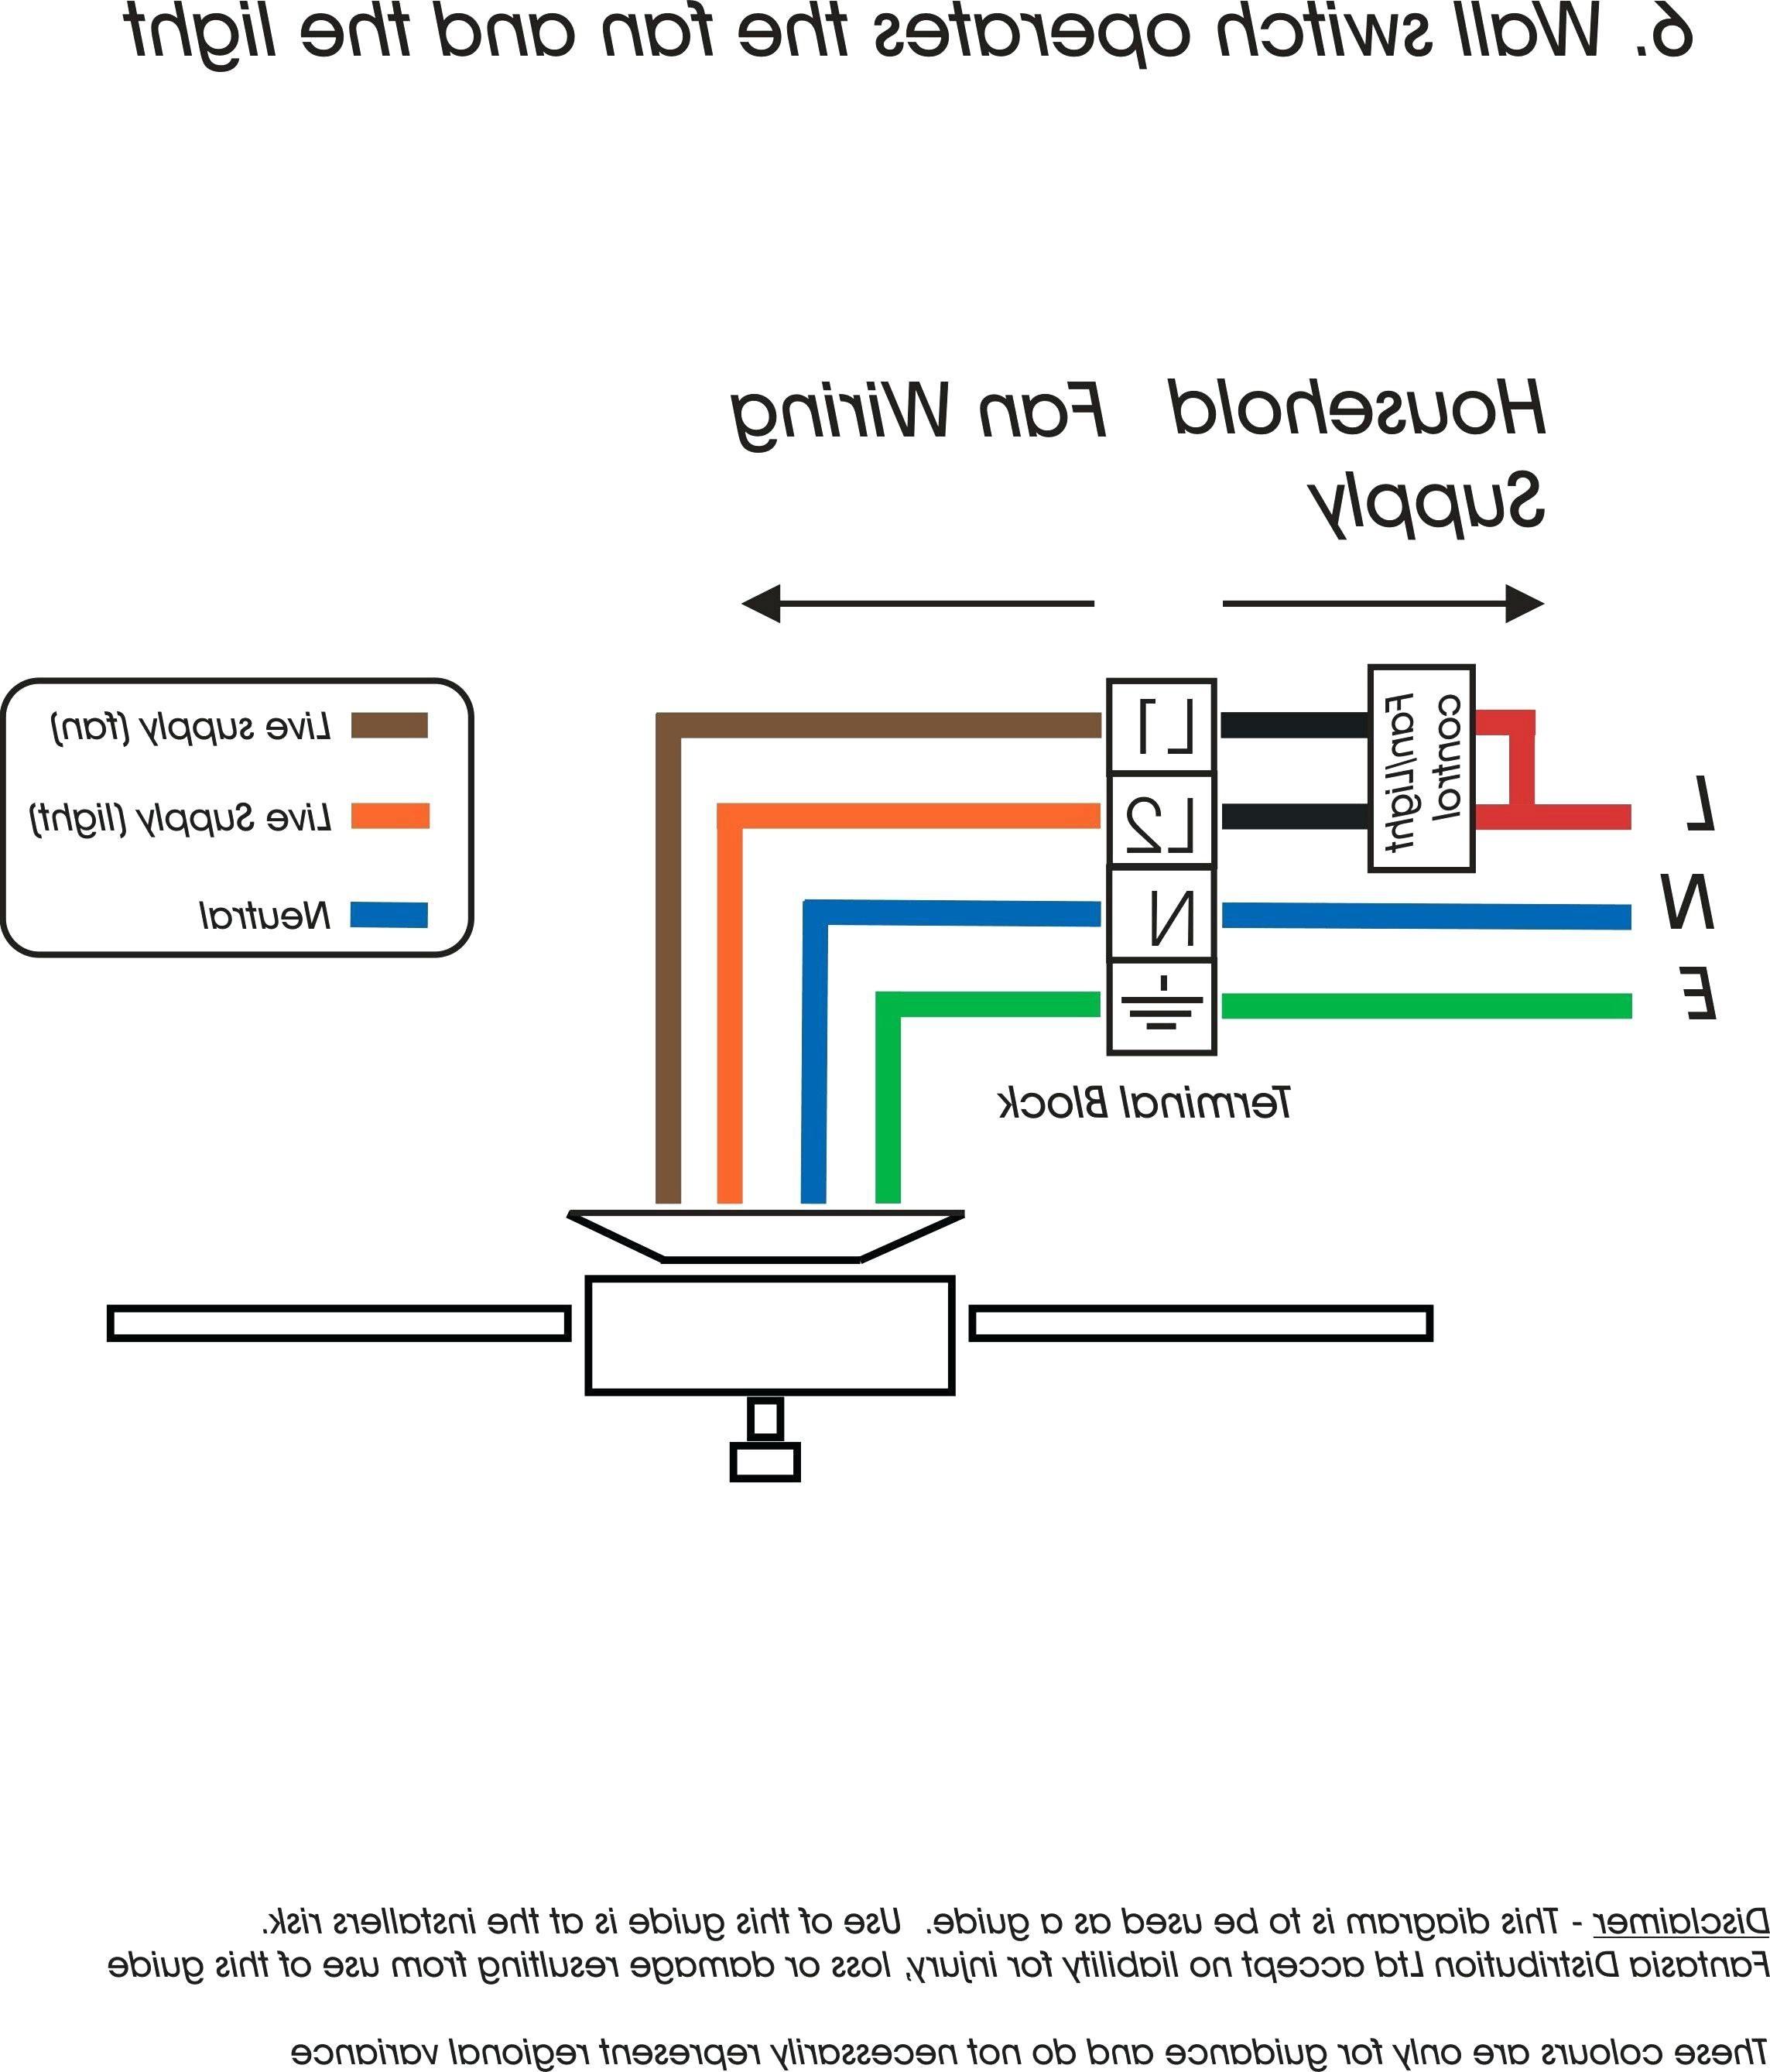 Tail Light Wiring Diagram Fresh Wiring Diagram for Bathroom Fan and Light Panasonic